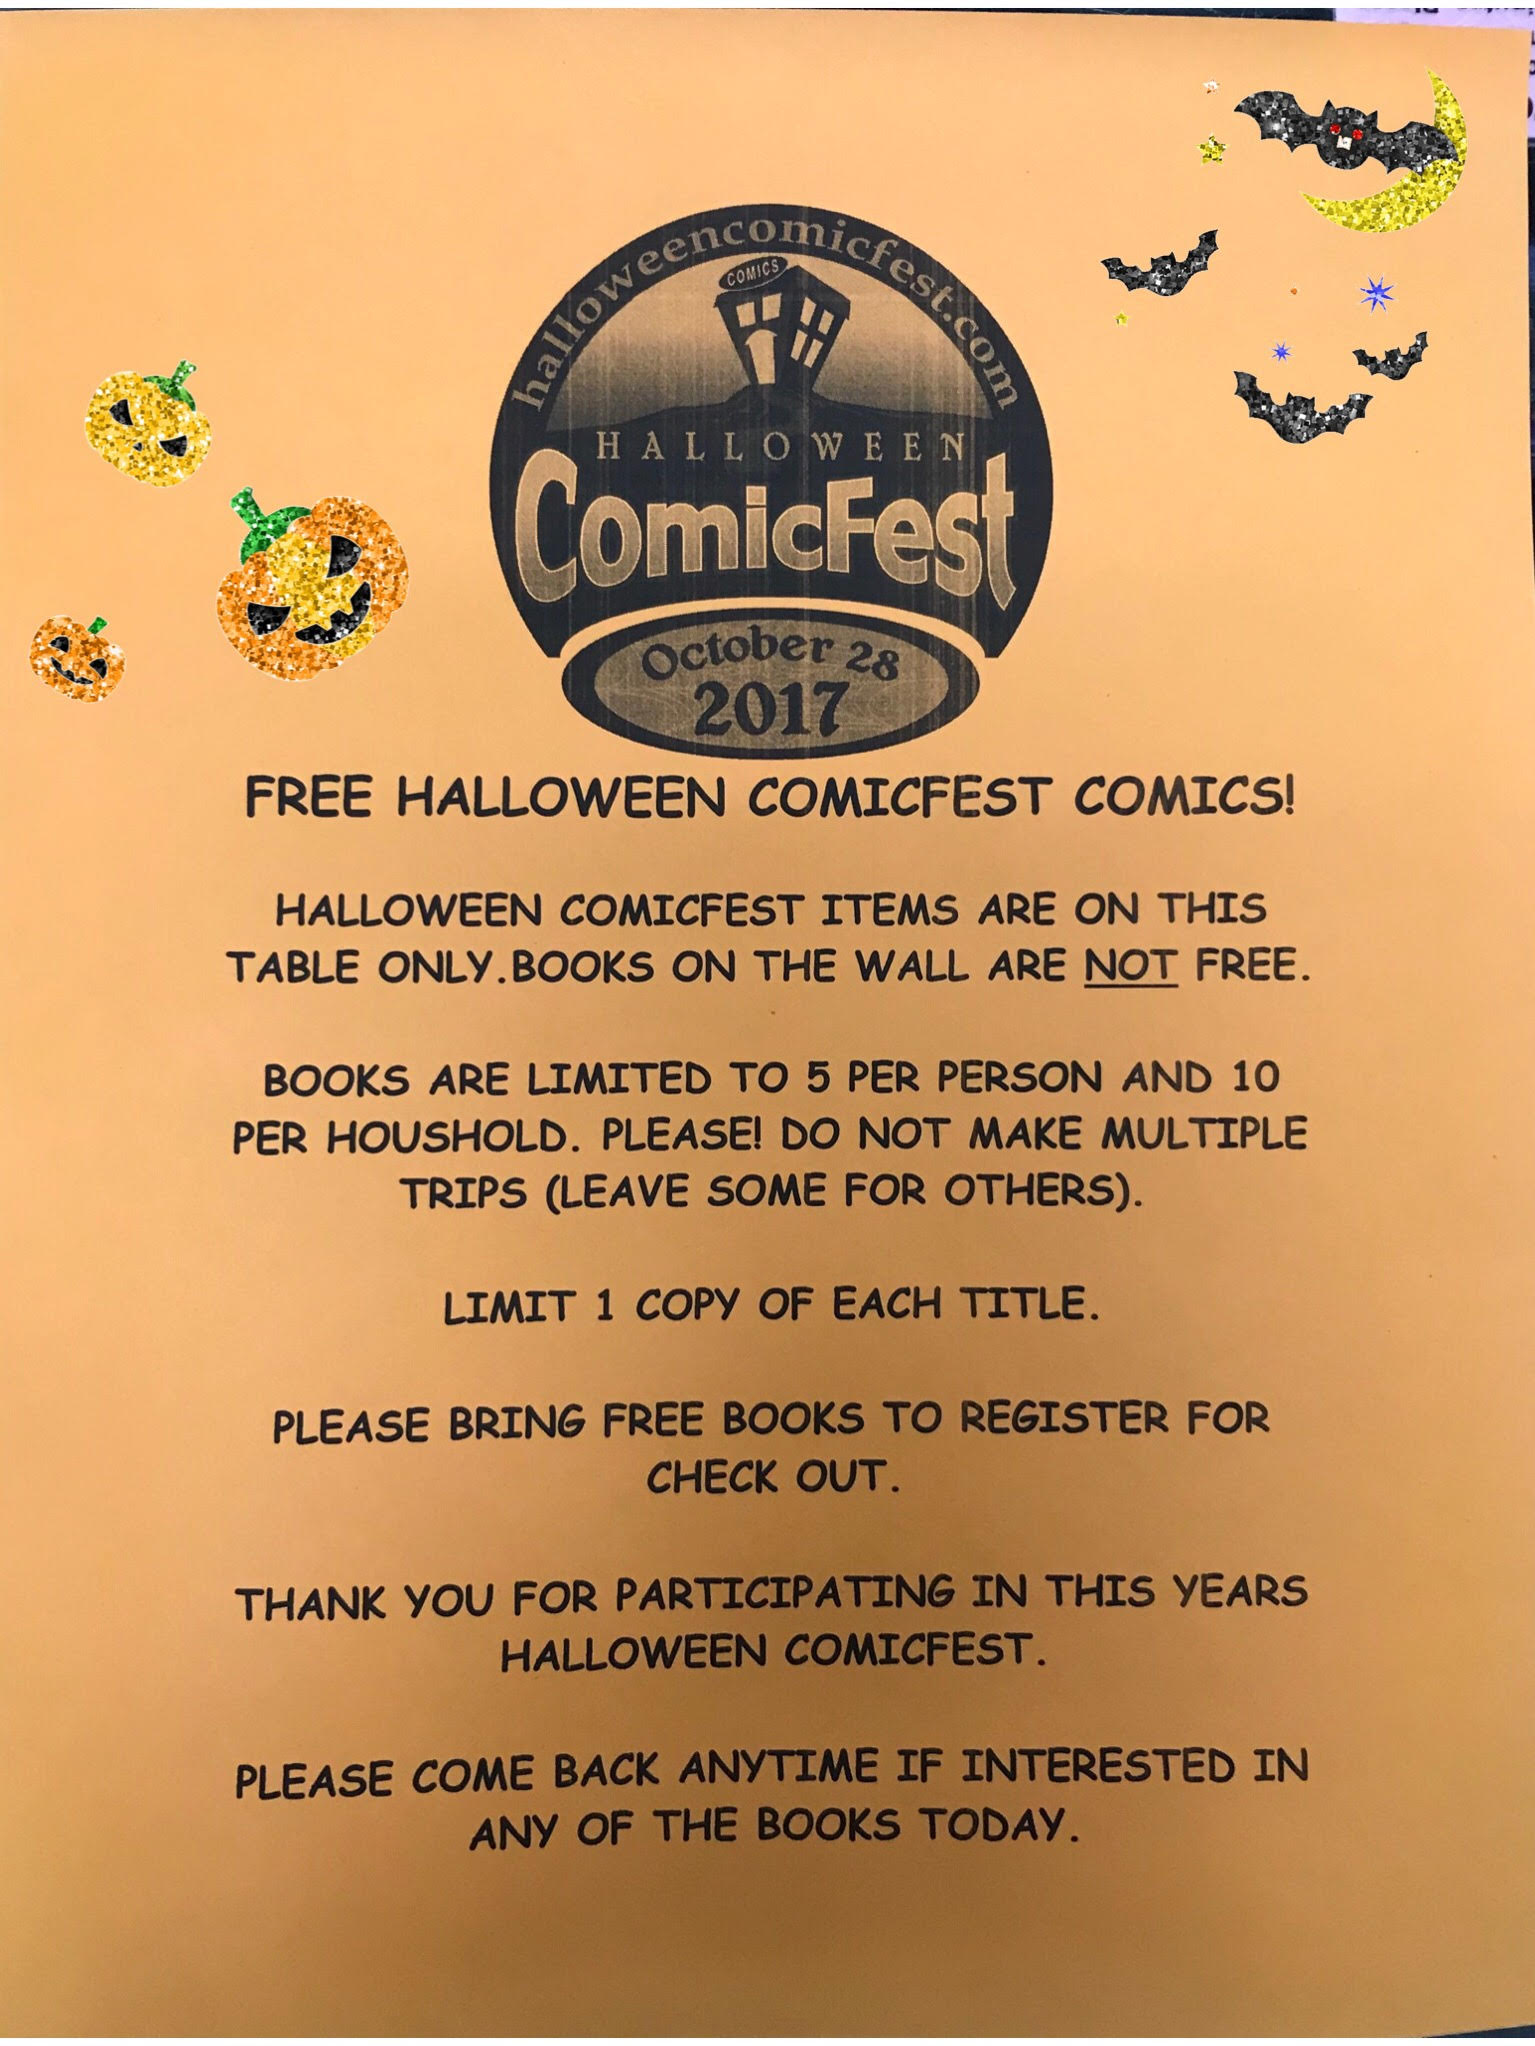 halloween comic fest comic 1.jpg